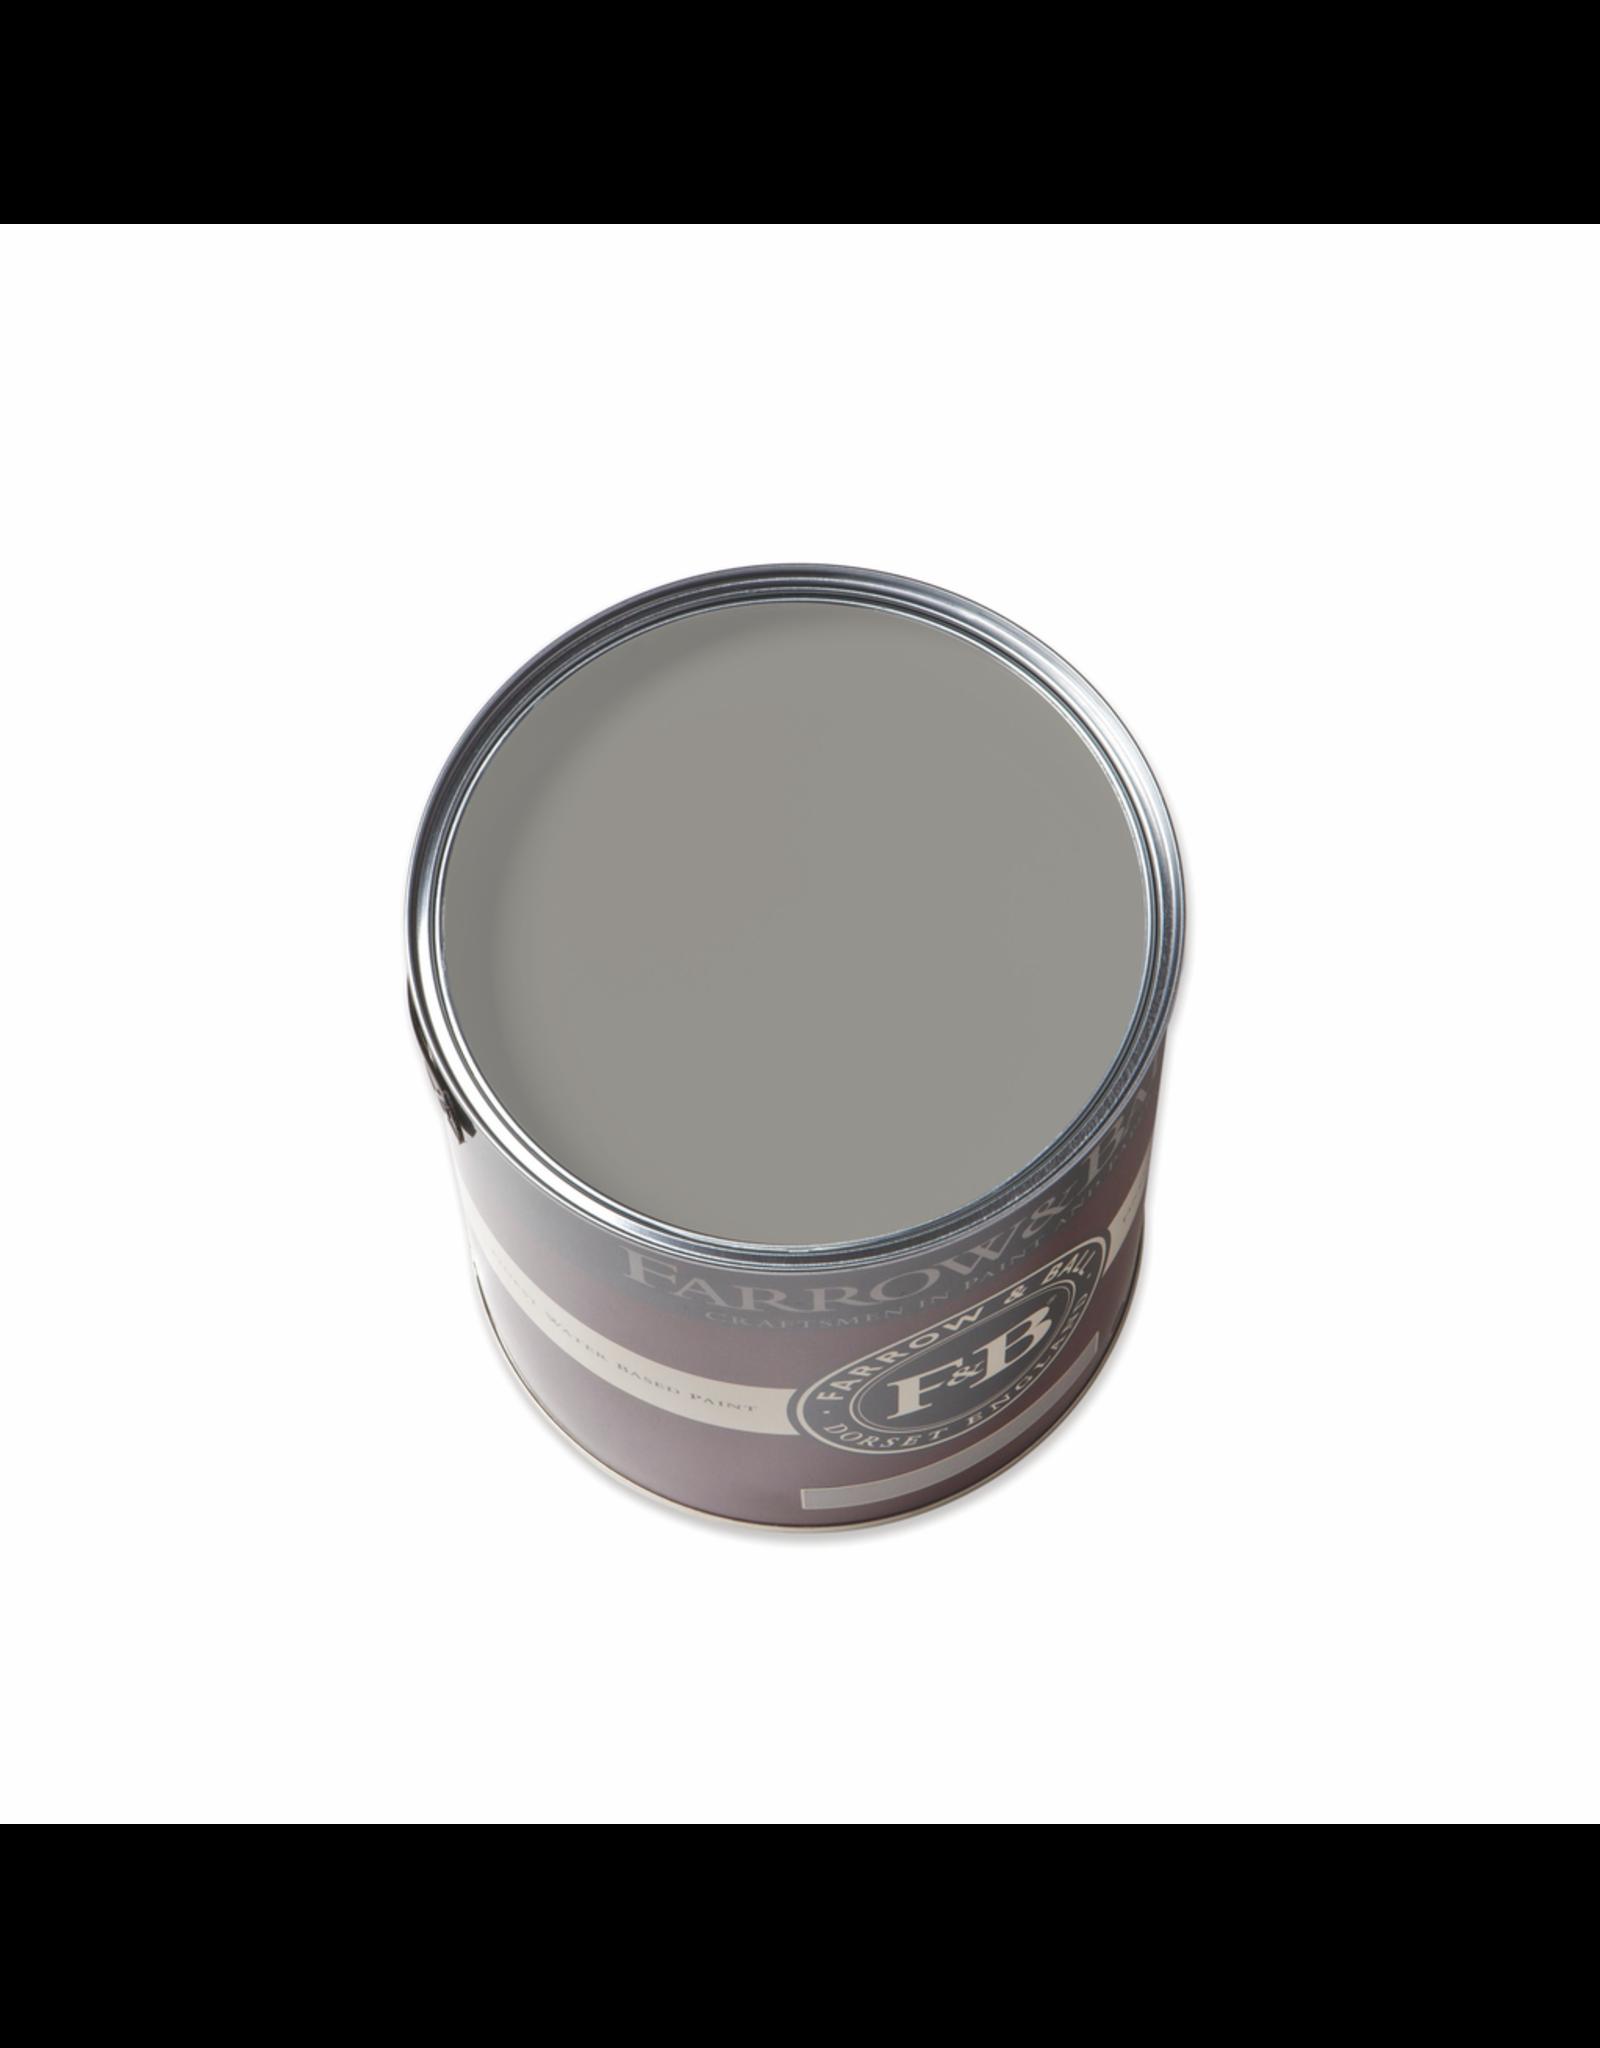 Farrow and Ball Gallon Modern Emulsion Worsted No. 284